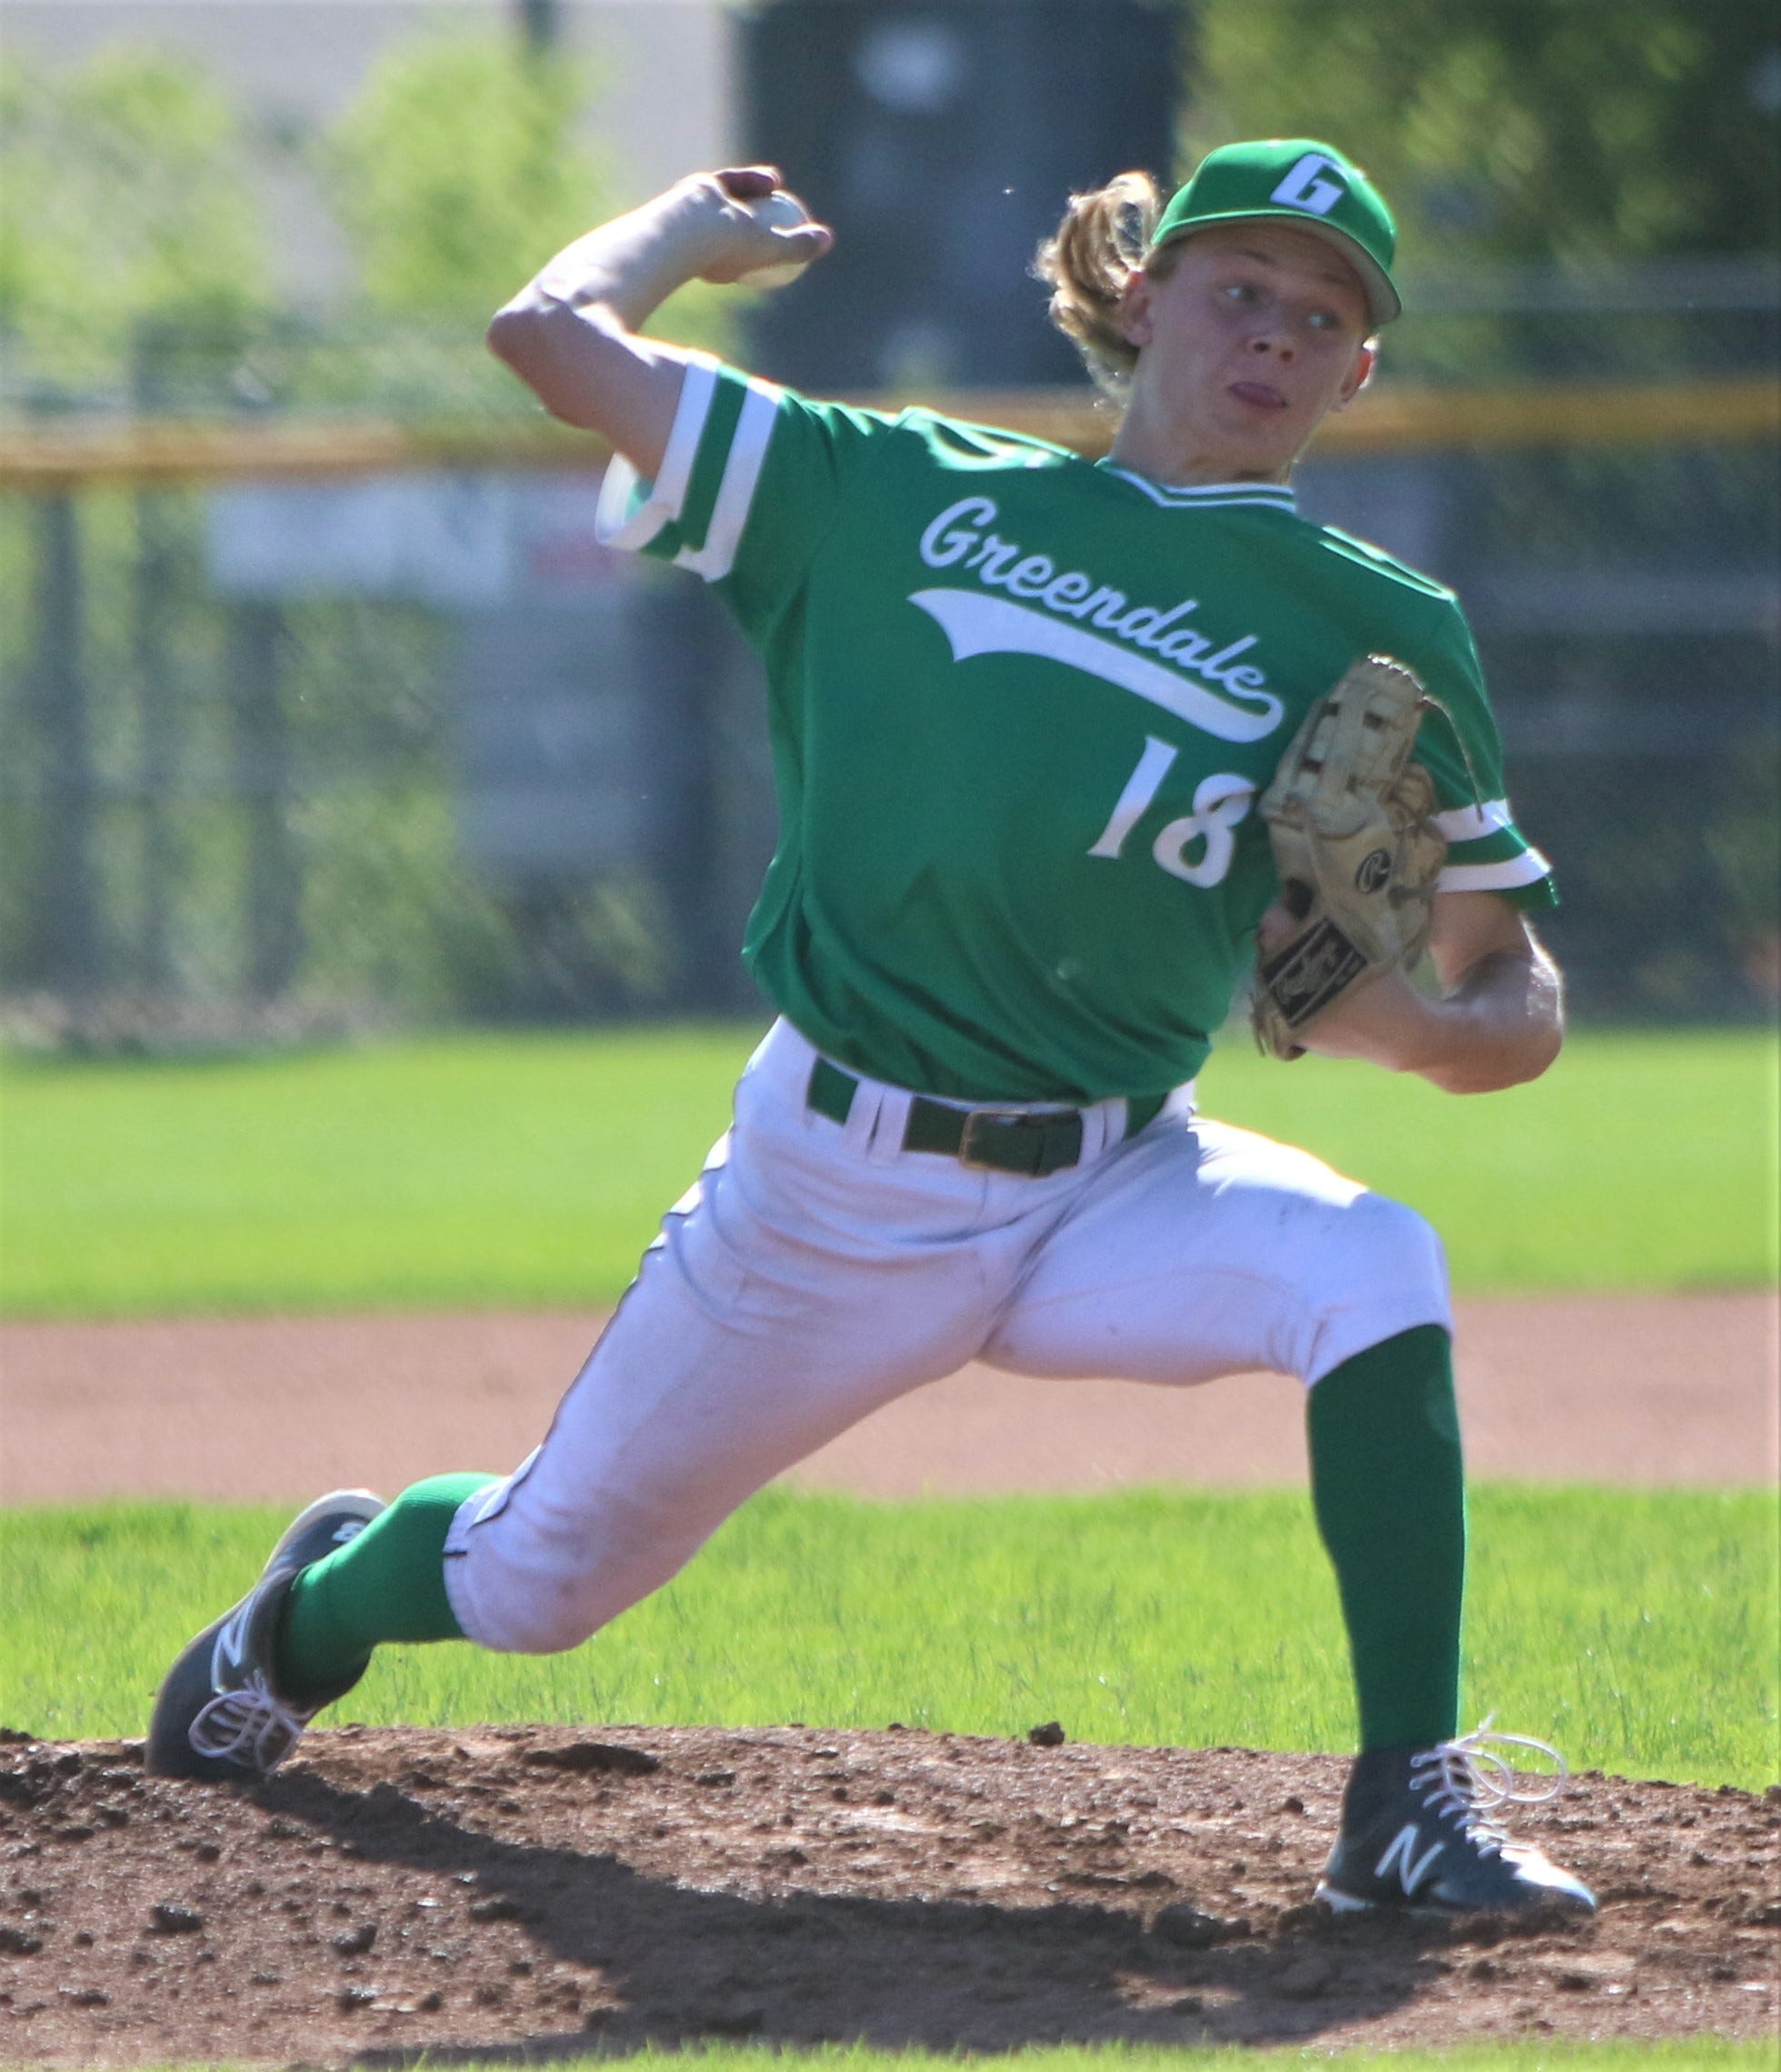 Prep pitcher spotlight: Purdue recruit Tristan Ellis hands Pewaukee its first loss of the year